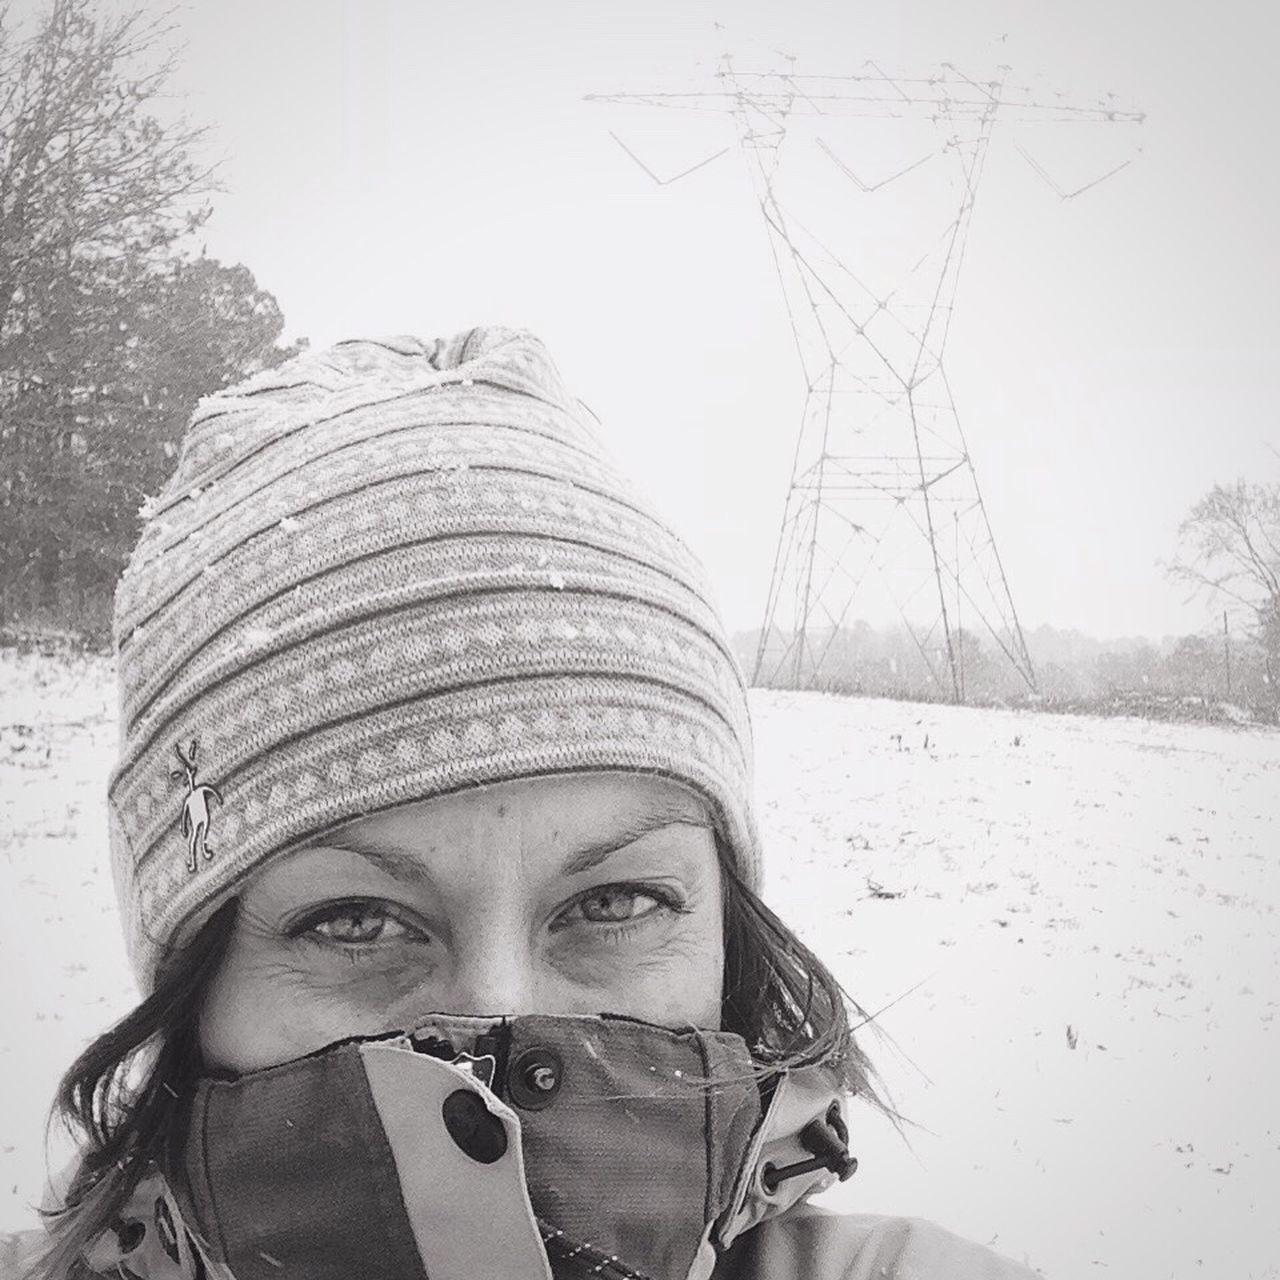 Girl Power Winter Snow NC North Carolina Explore Outside Explore Outside